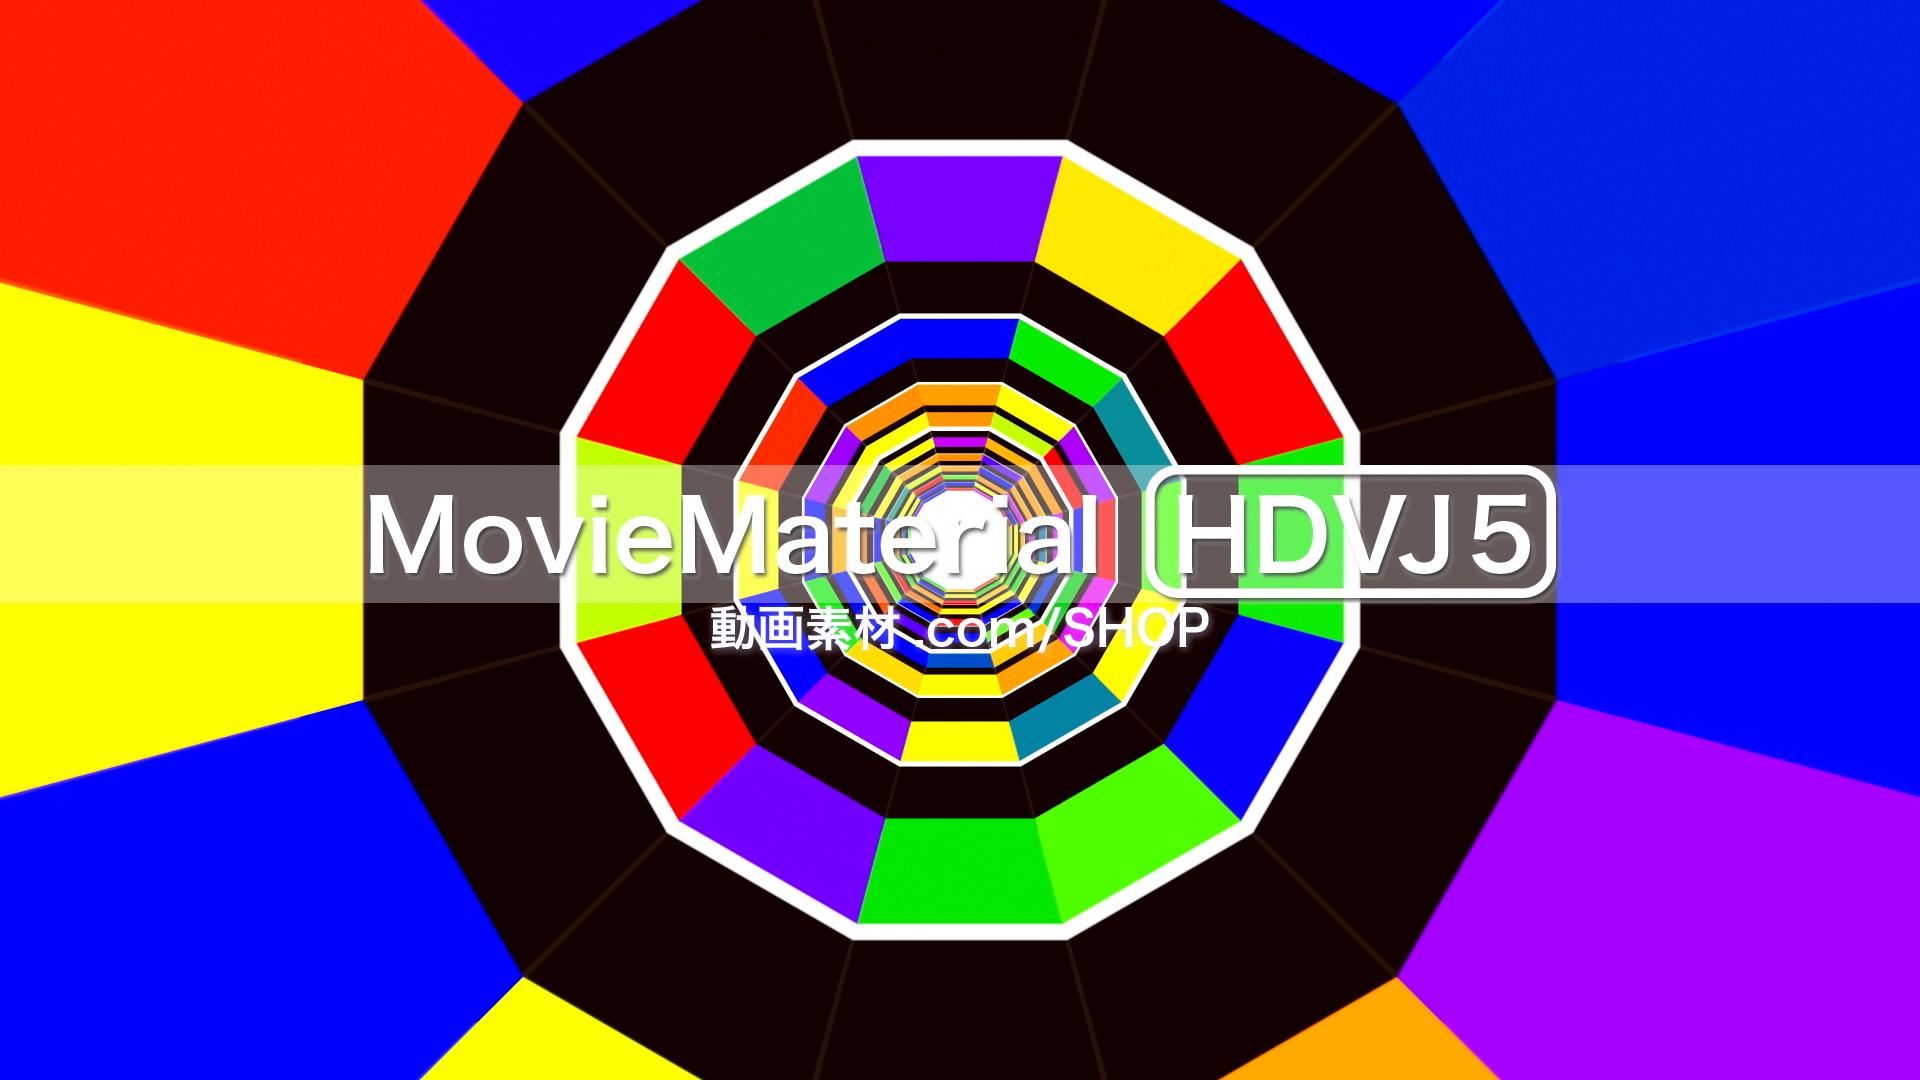 MovieMaterial HDVJ5 フルハイビジョンVJ動画素材集 画像2